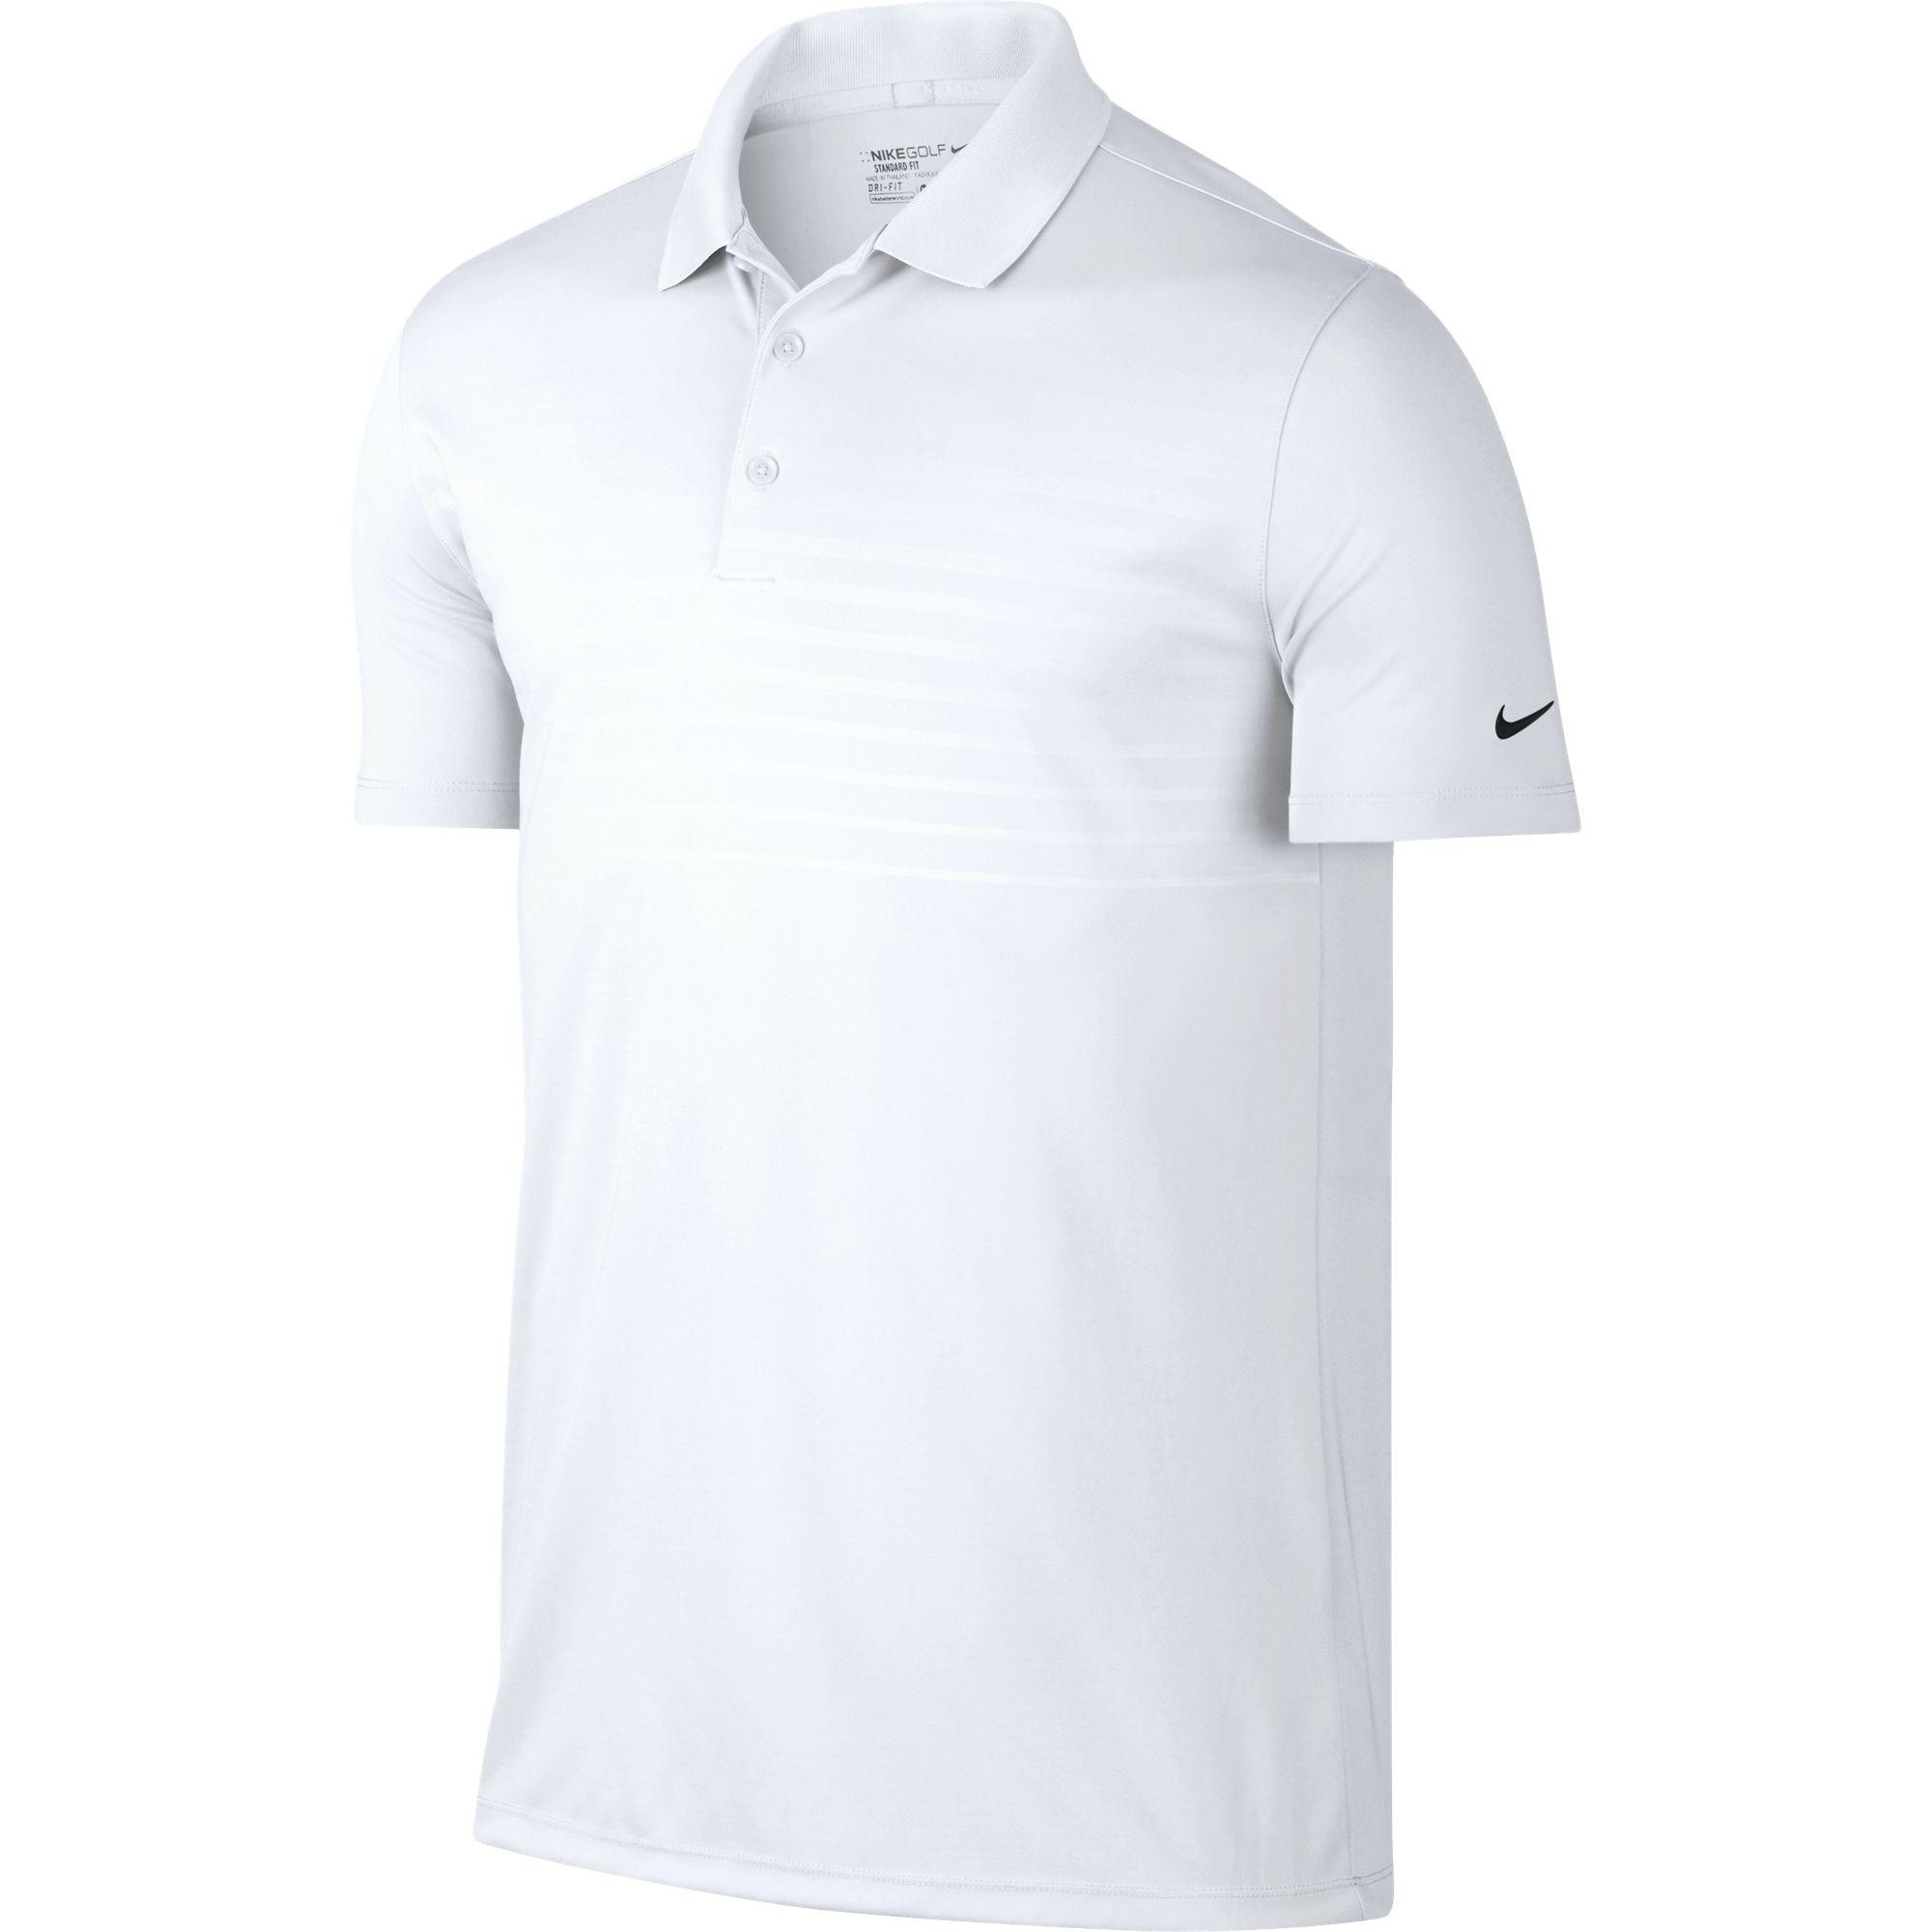 2016 nike victory polo 2 0 emboss golf shirt 802878 ebay for Nike golf victory polo shirt